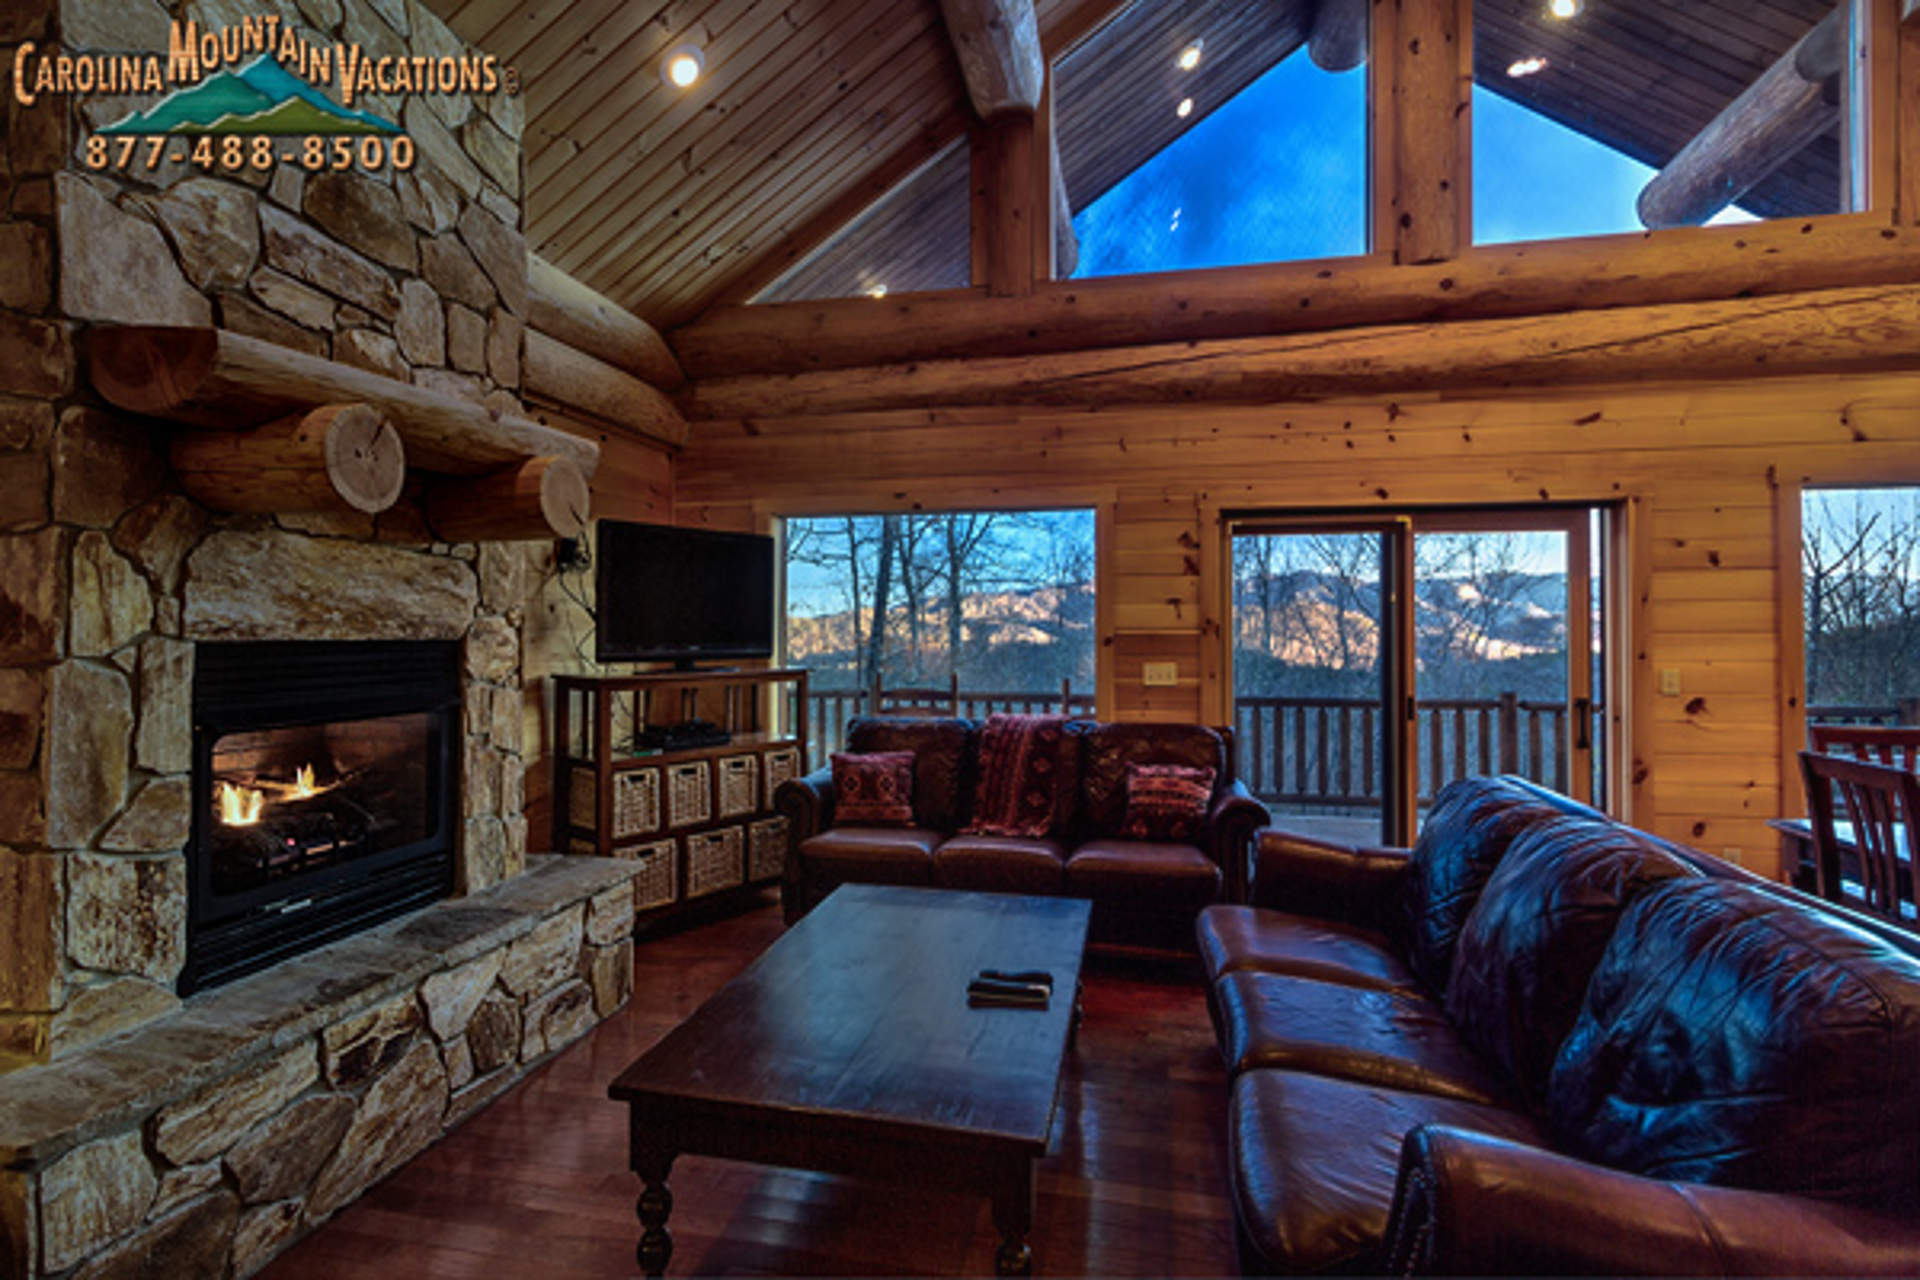 Ridge Runner Hideout Nantahala NC Vacation Rental Cabin